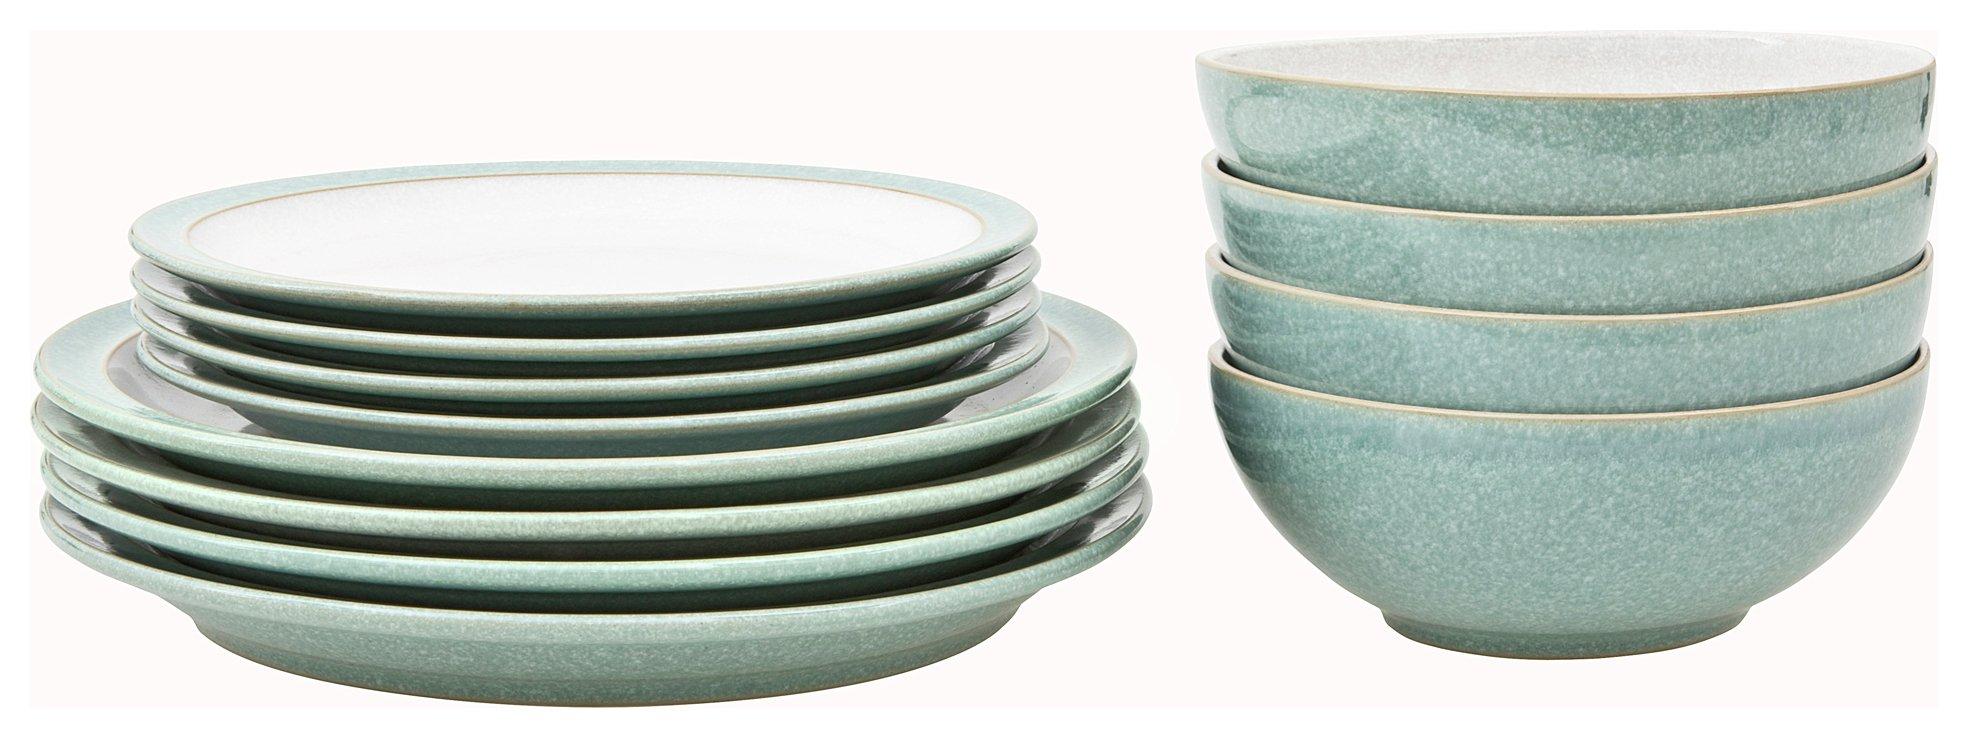 Denby Elements 12 Piece Ceramic Tableware - Green